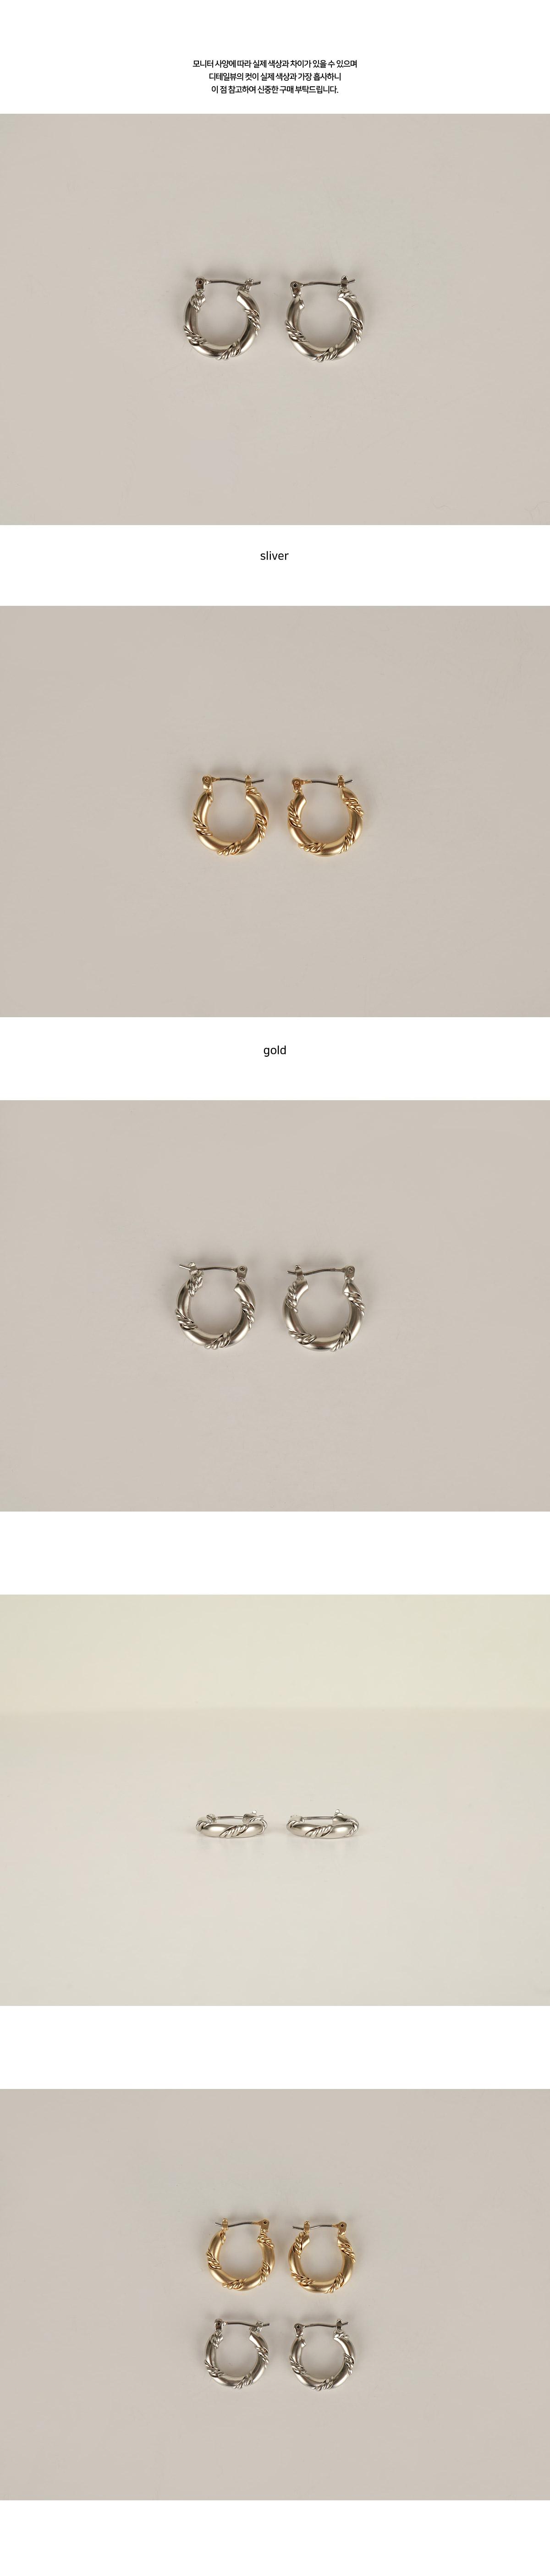 Snay earrings